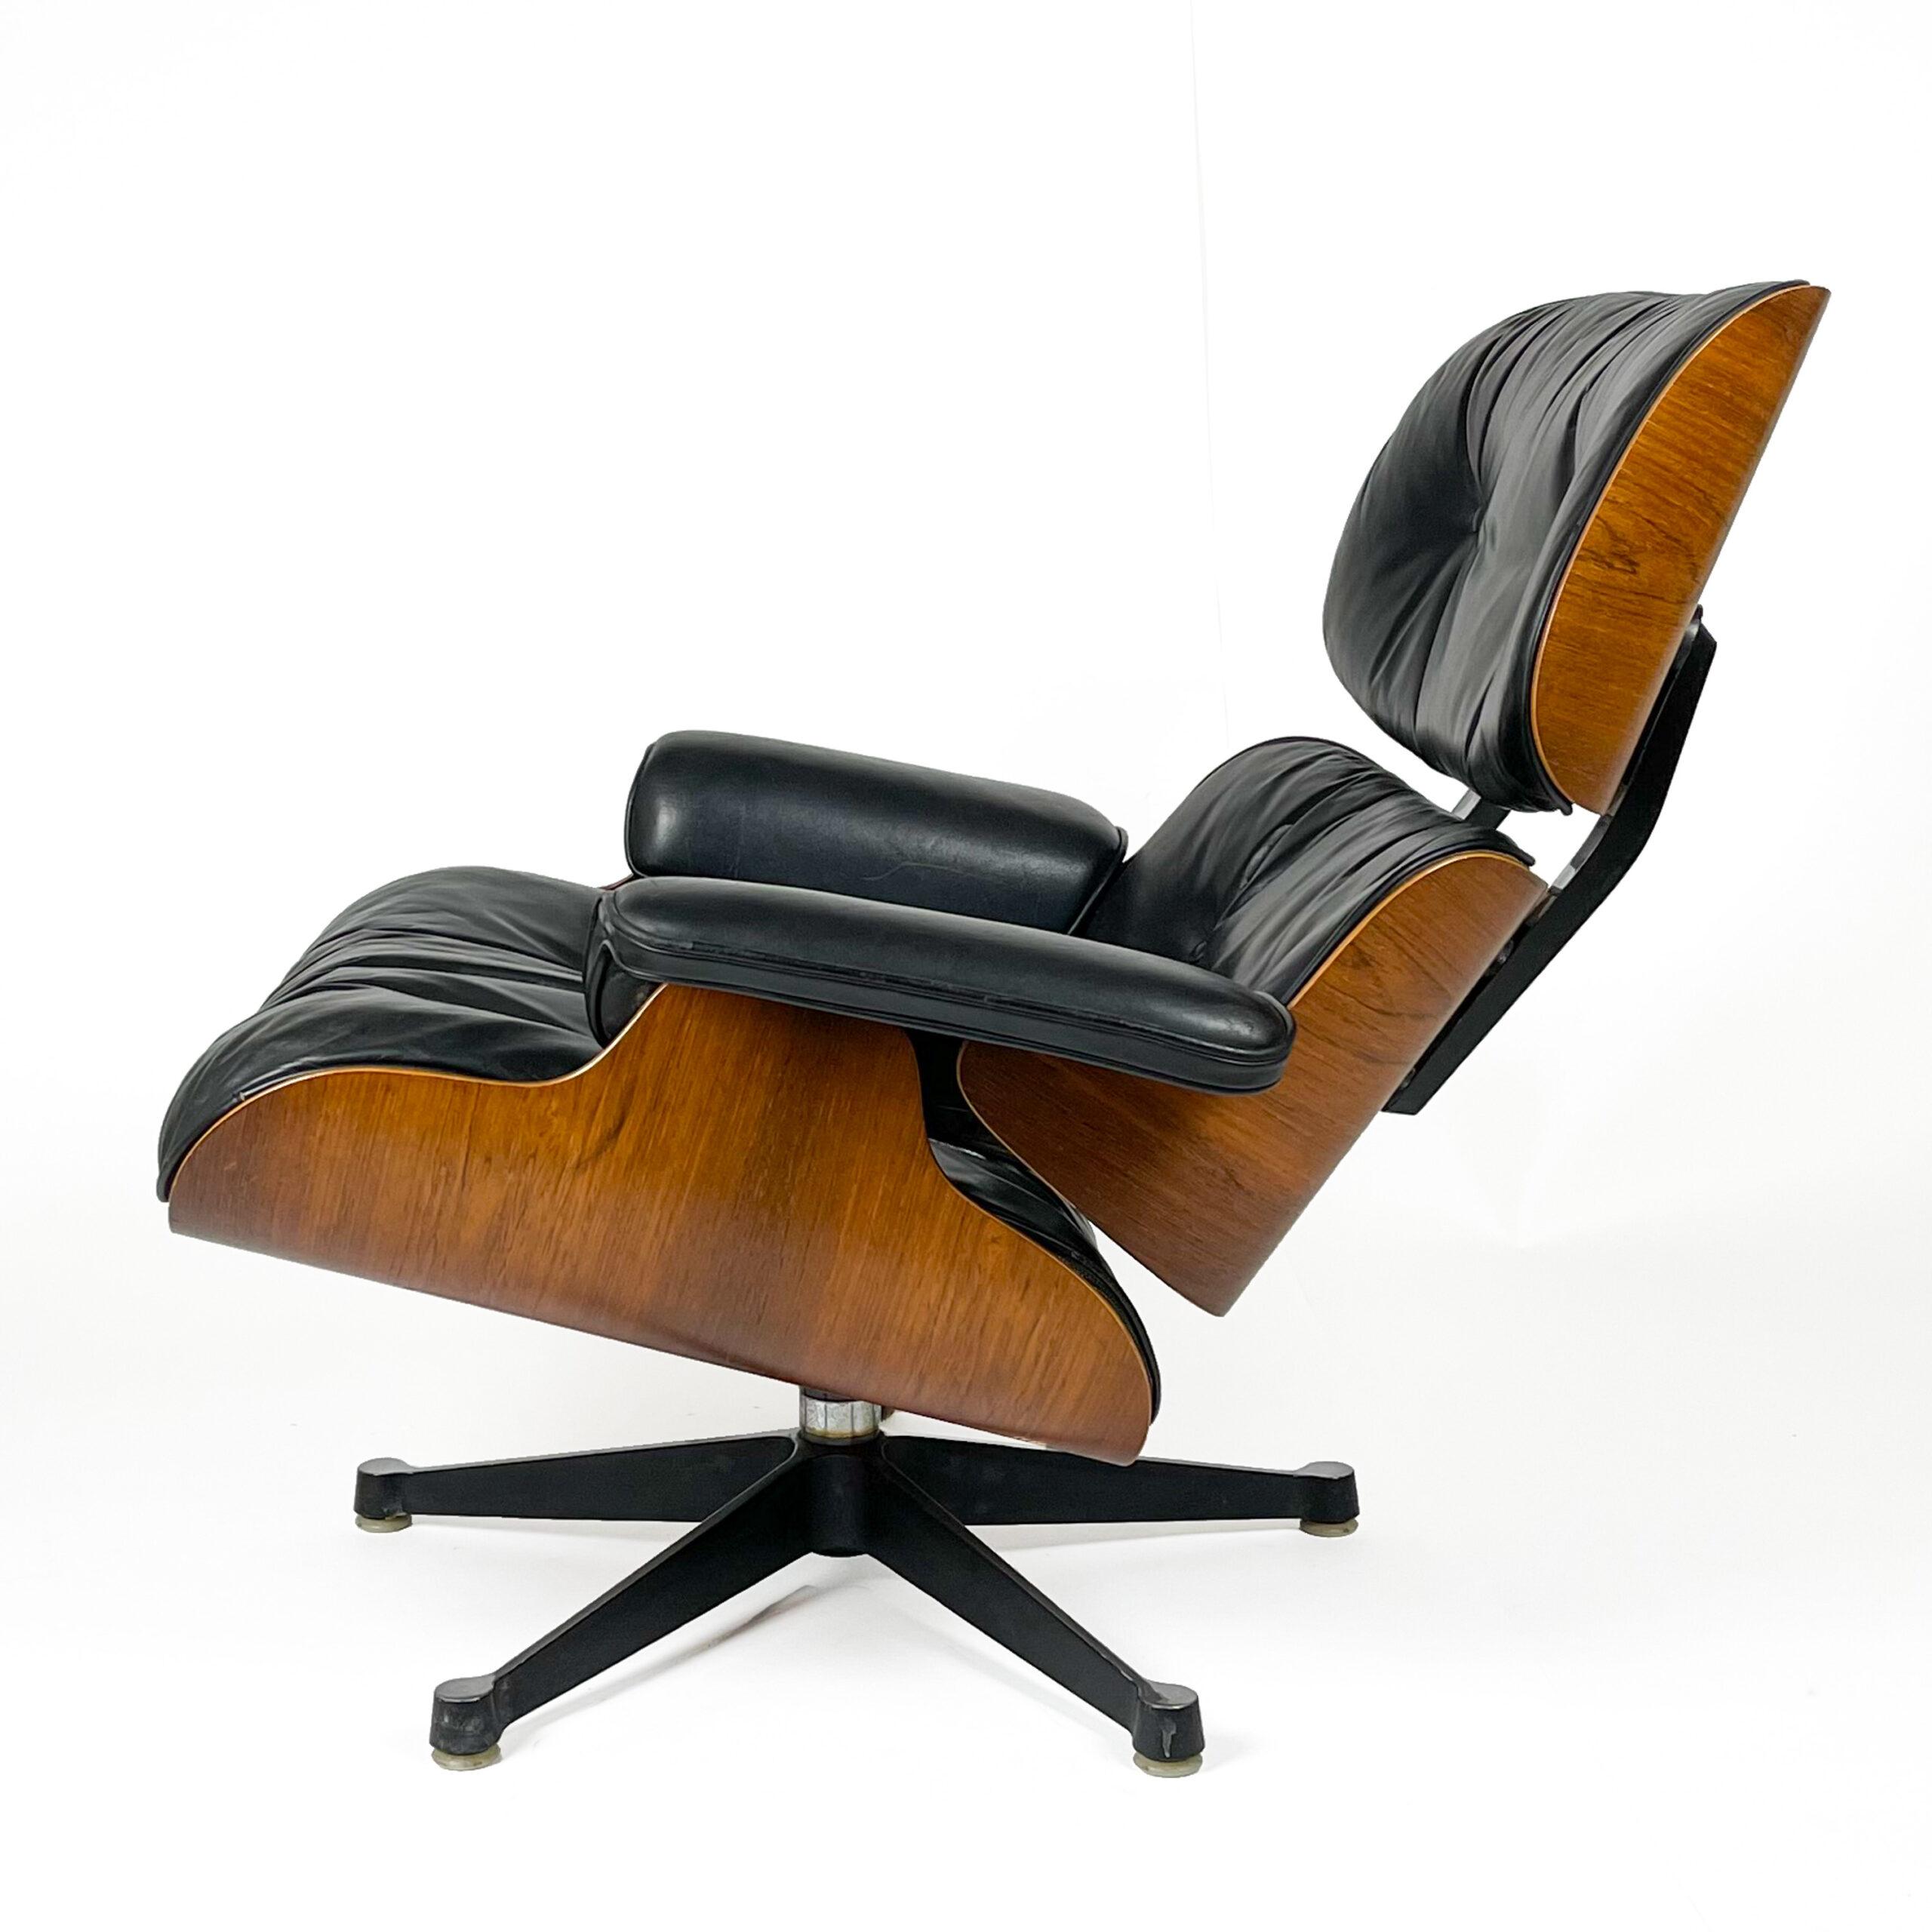 Eames Lounge Ottoman web-1133